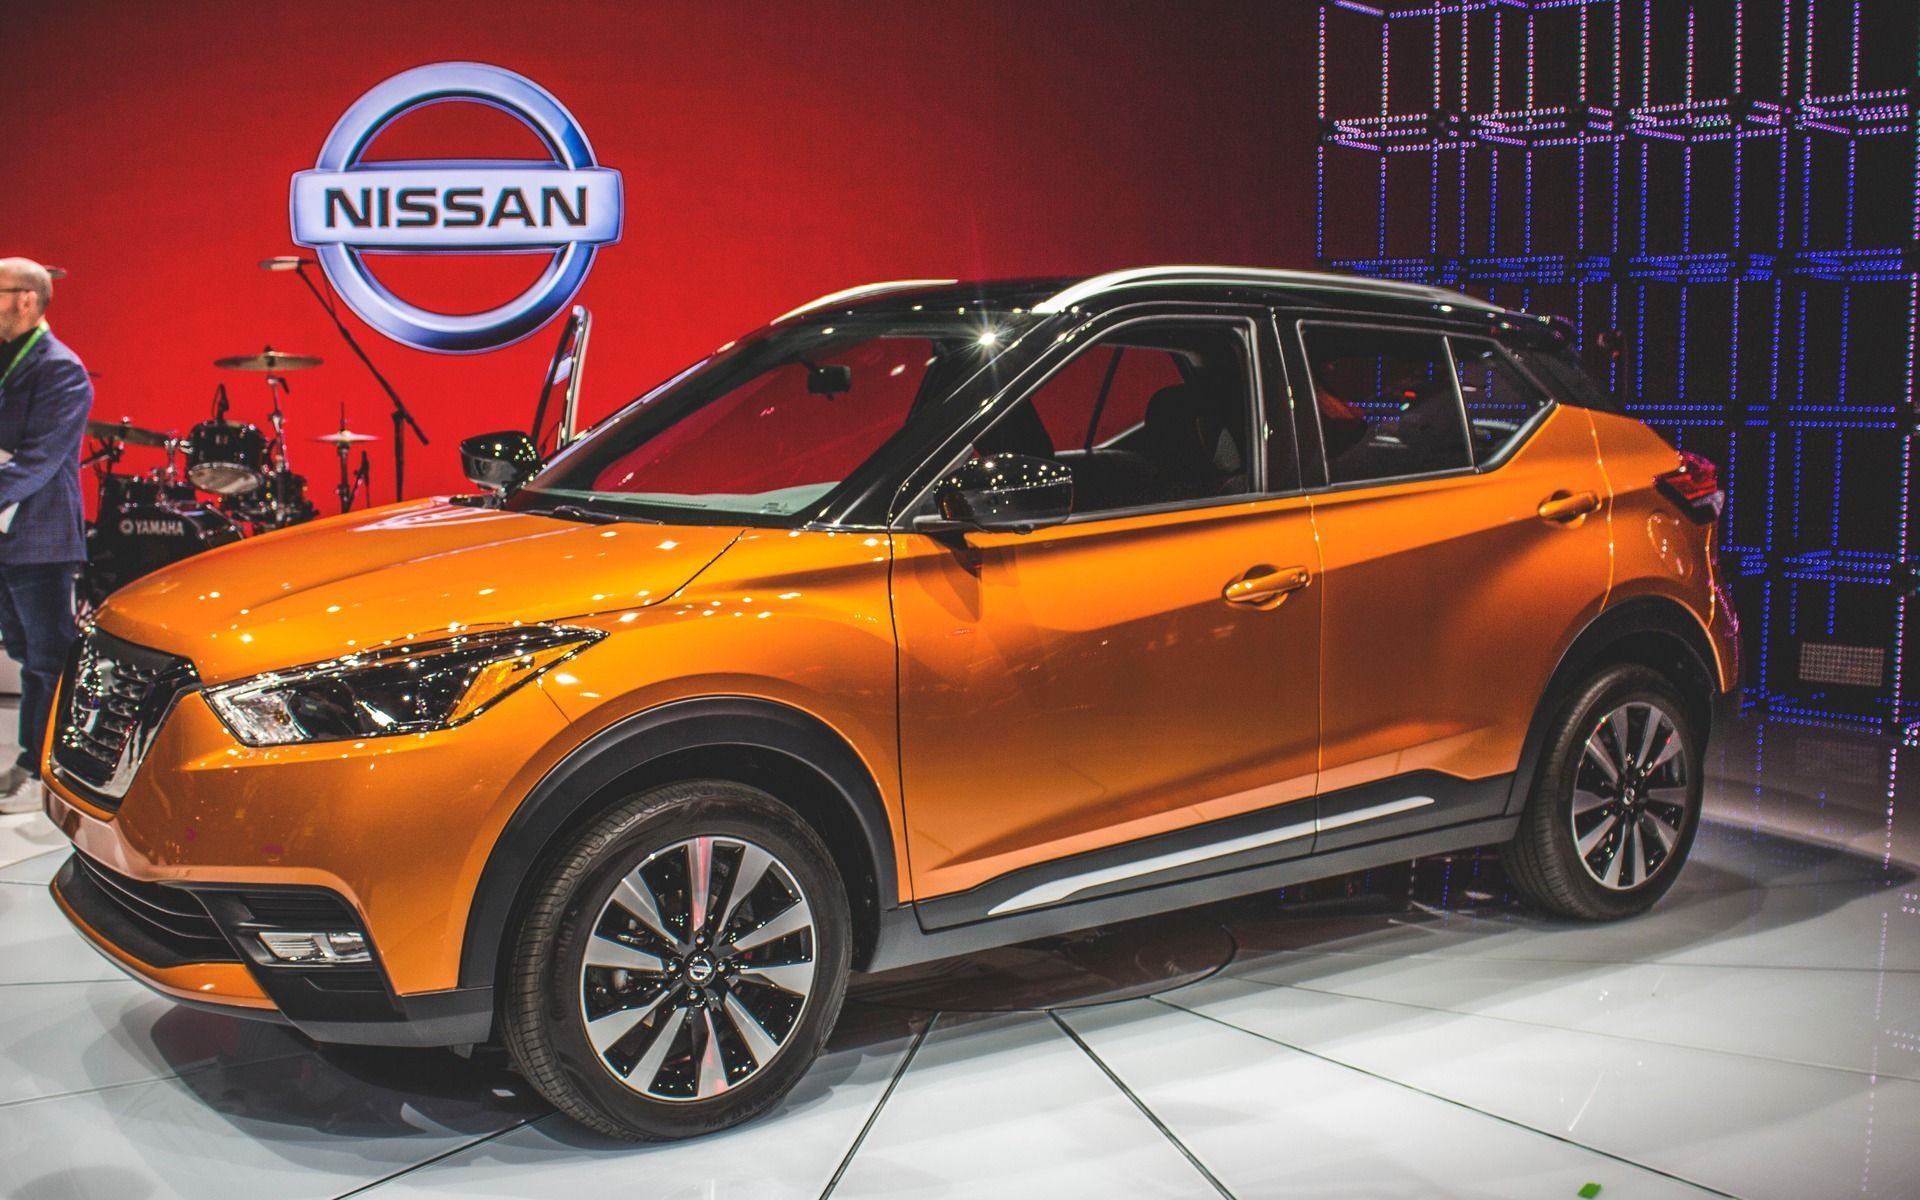 New Nissan Kicks 2019 Review Speed Test | SUV